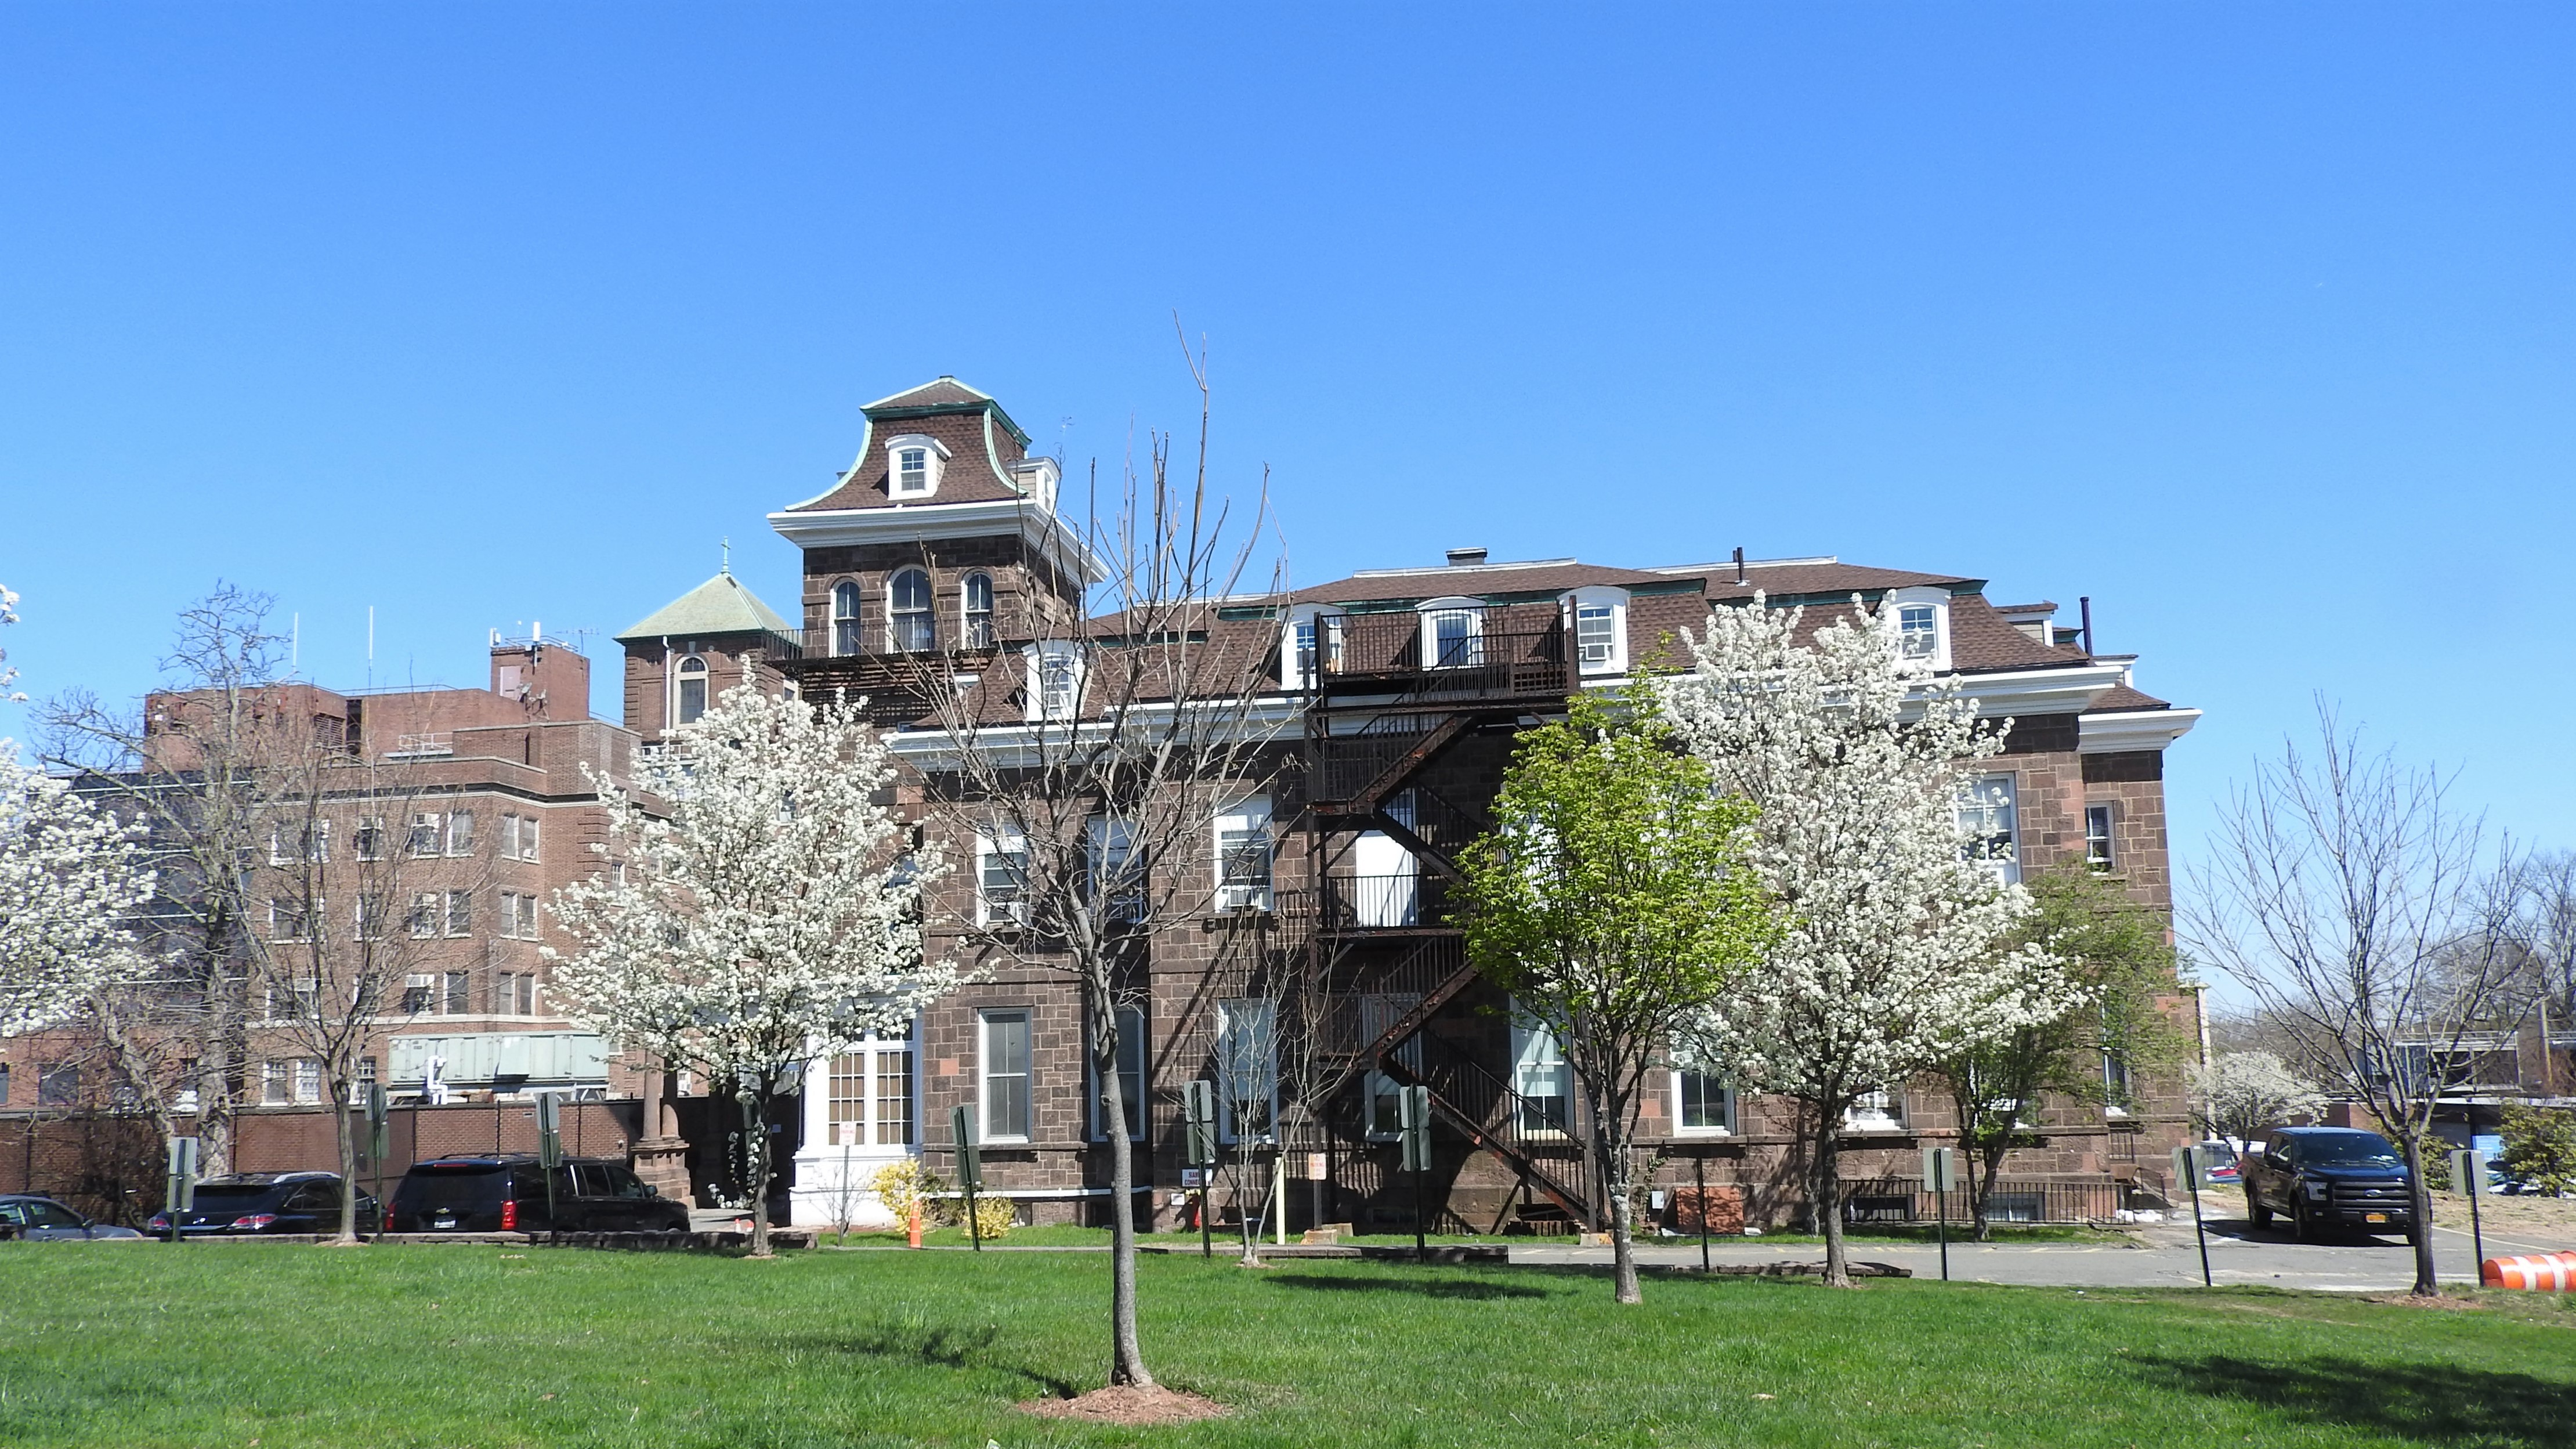 Richmond University Medical Center - Wikipedia